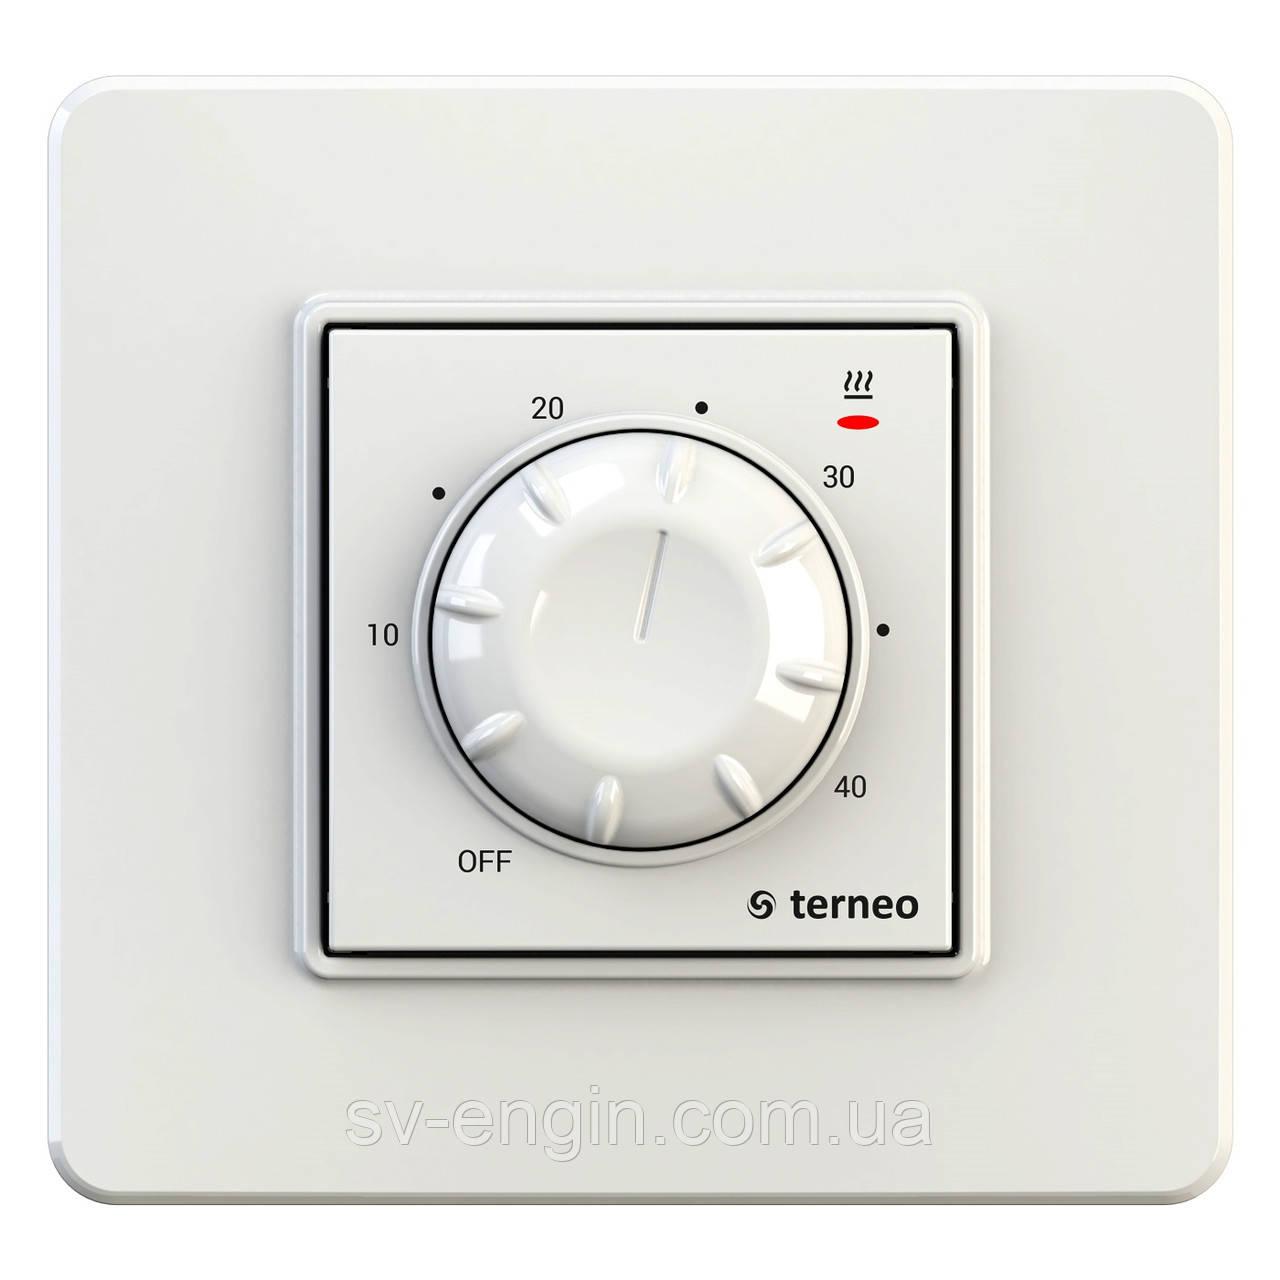 RTP, RTP UNIC, MEX, MEX UNIC, ST, ST UNIC (DS ELECTRONICS, Украина) - терморегуляторы для теплого пола